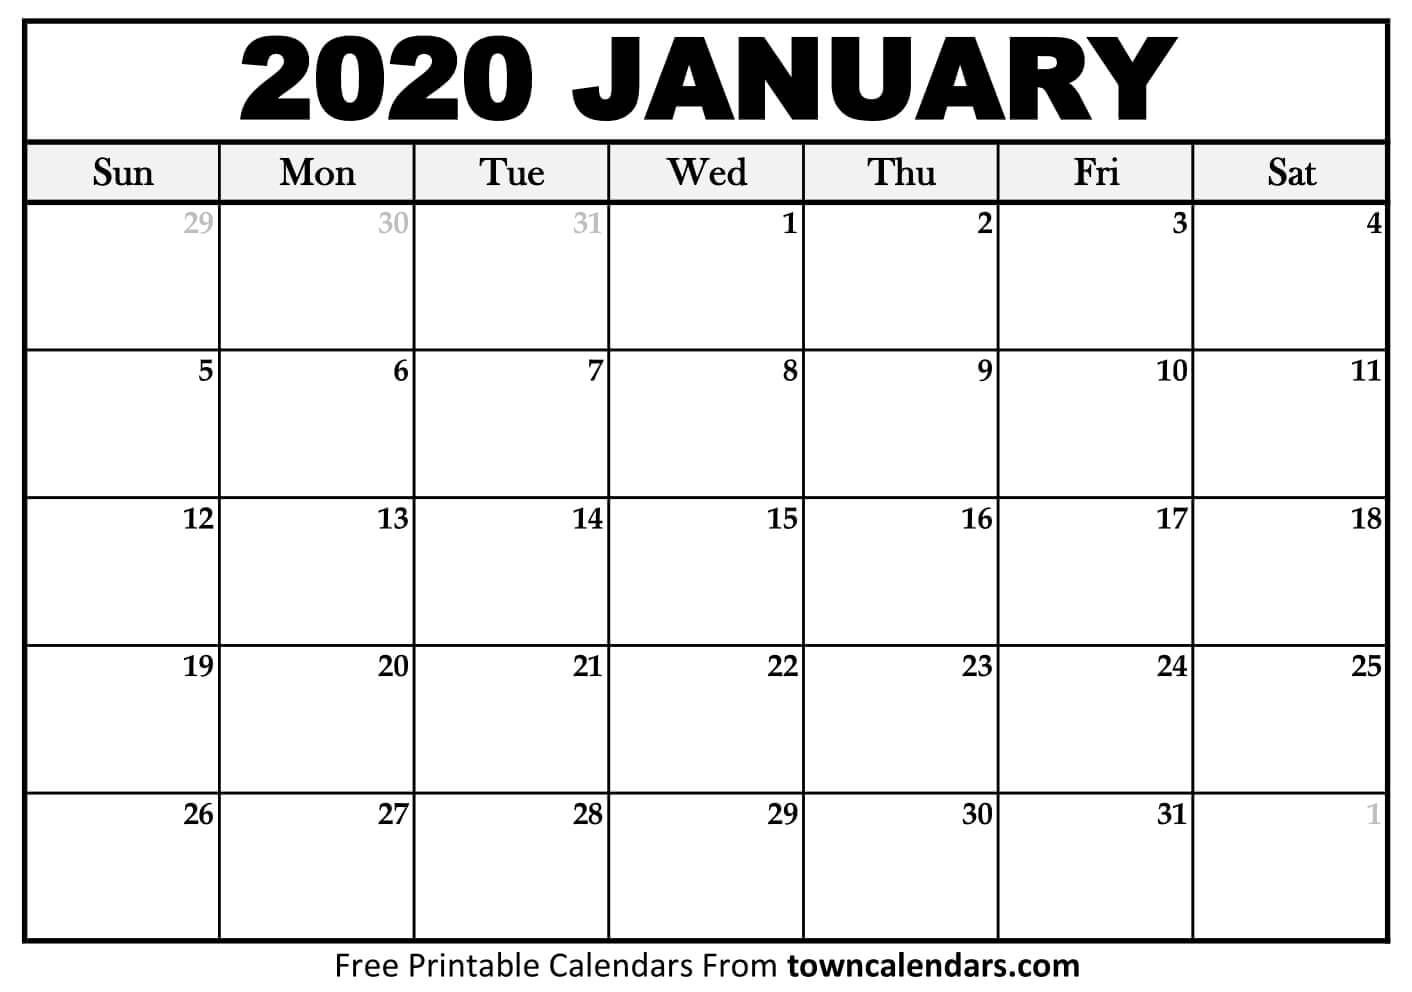 Printable January 2020 Calendar - Towncalendars